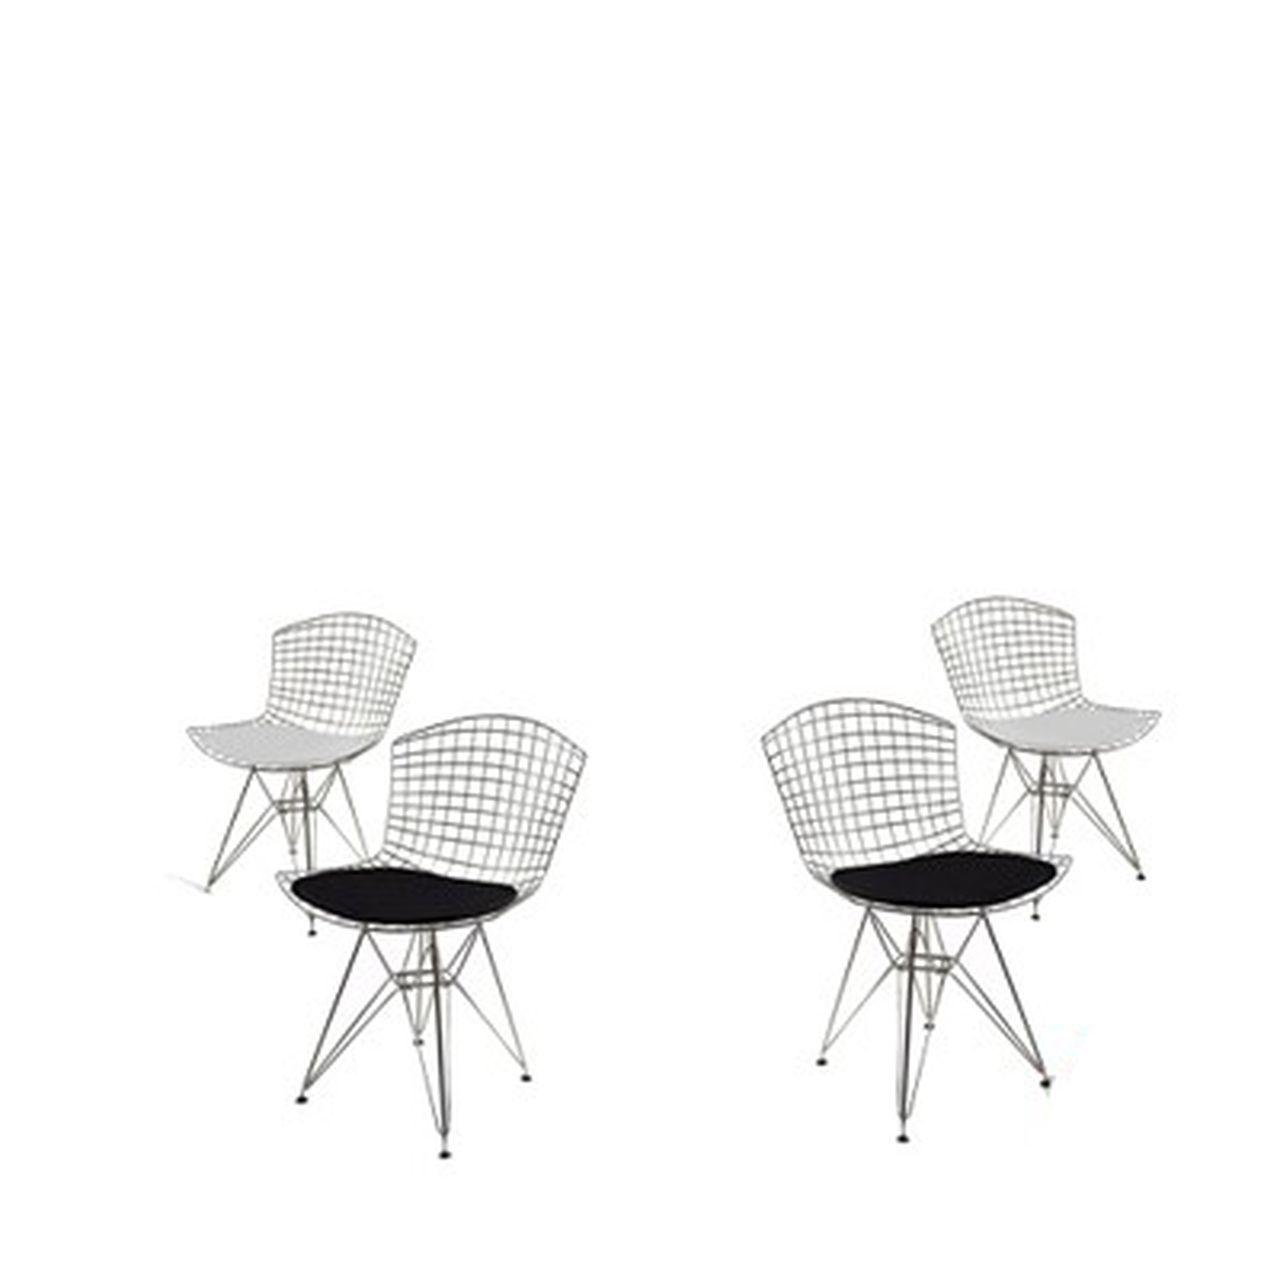 Kit 4x Cadeira Bertoia Dkr Cromada